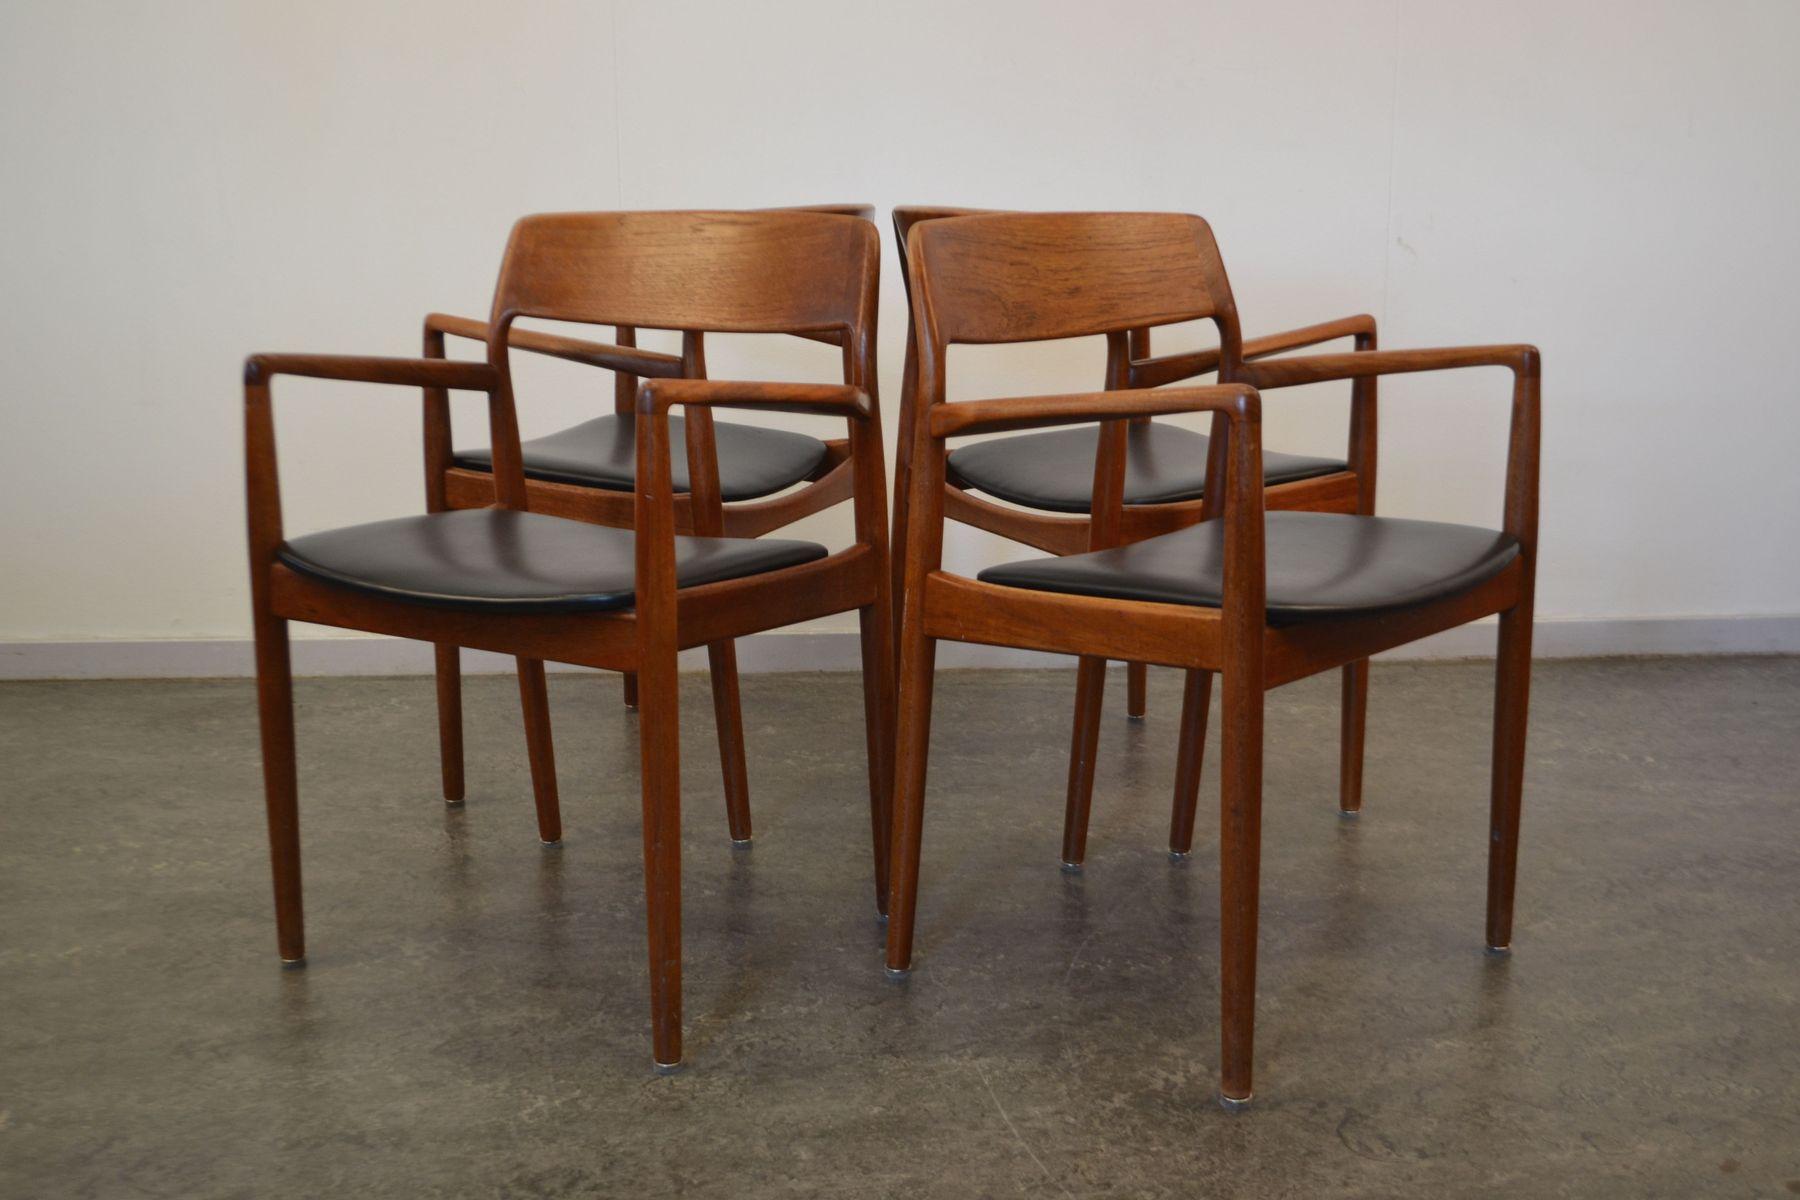 d nische vintage teak esszimmerst hle 4er set bei pamono kaufen. Black Bedroom Furniture Sets. Home Design Ideas